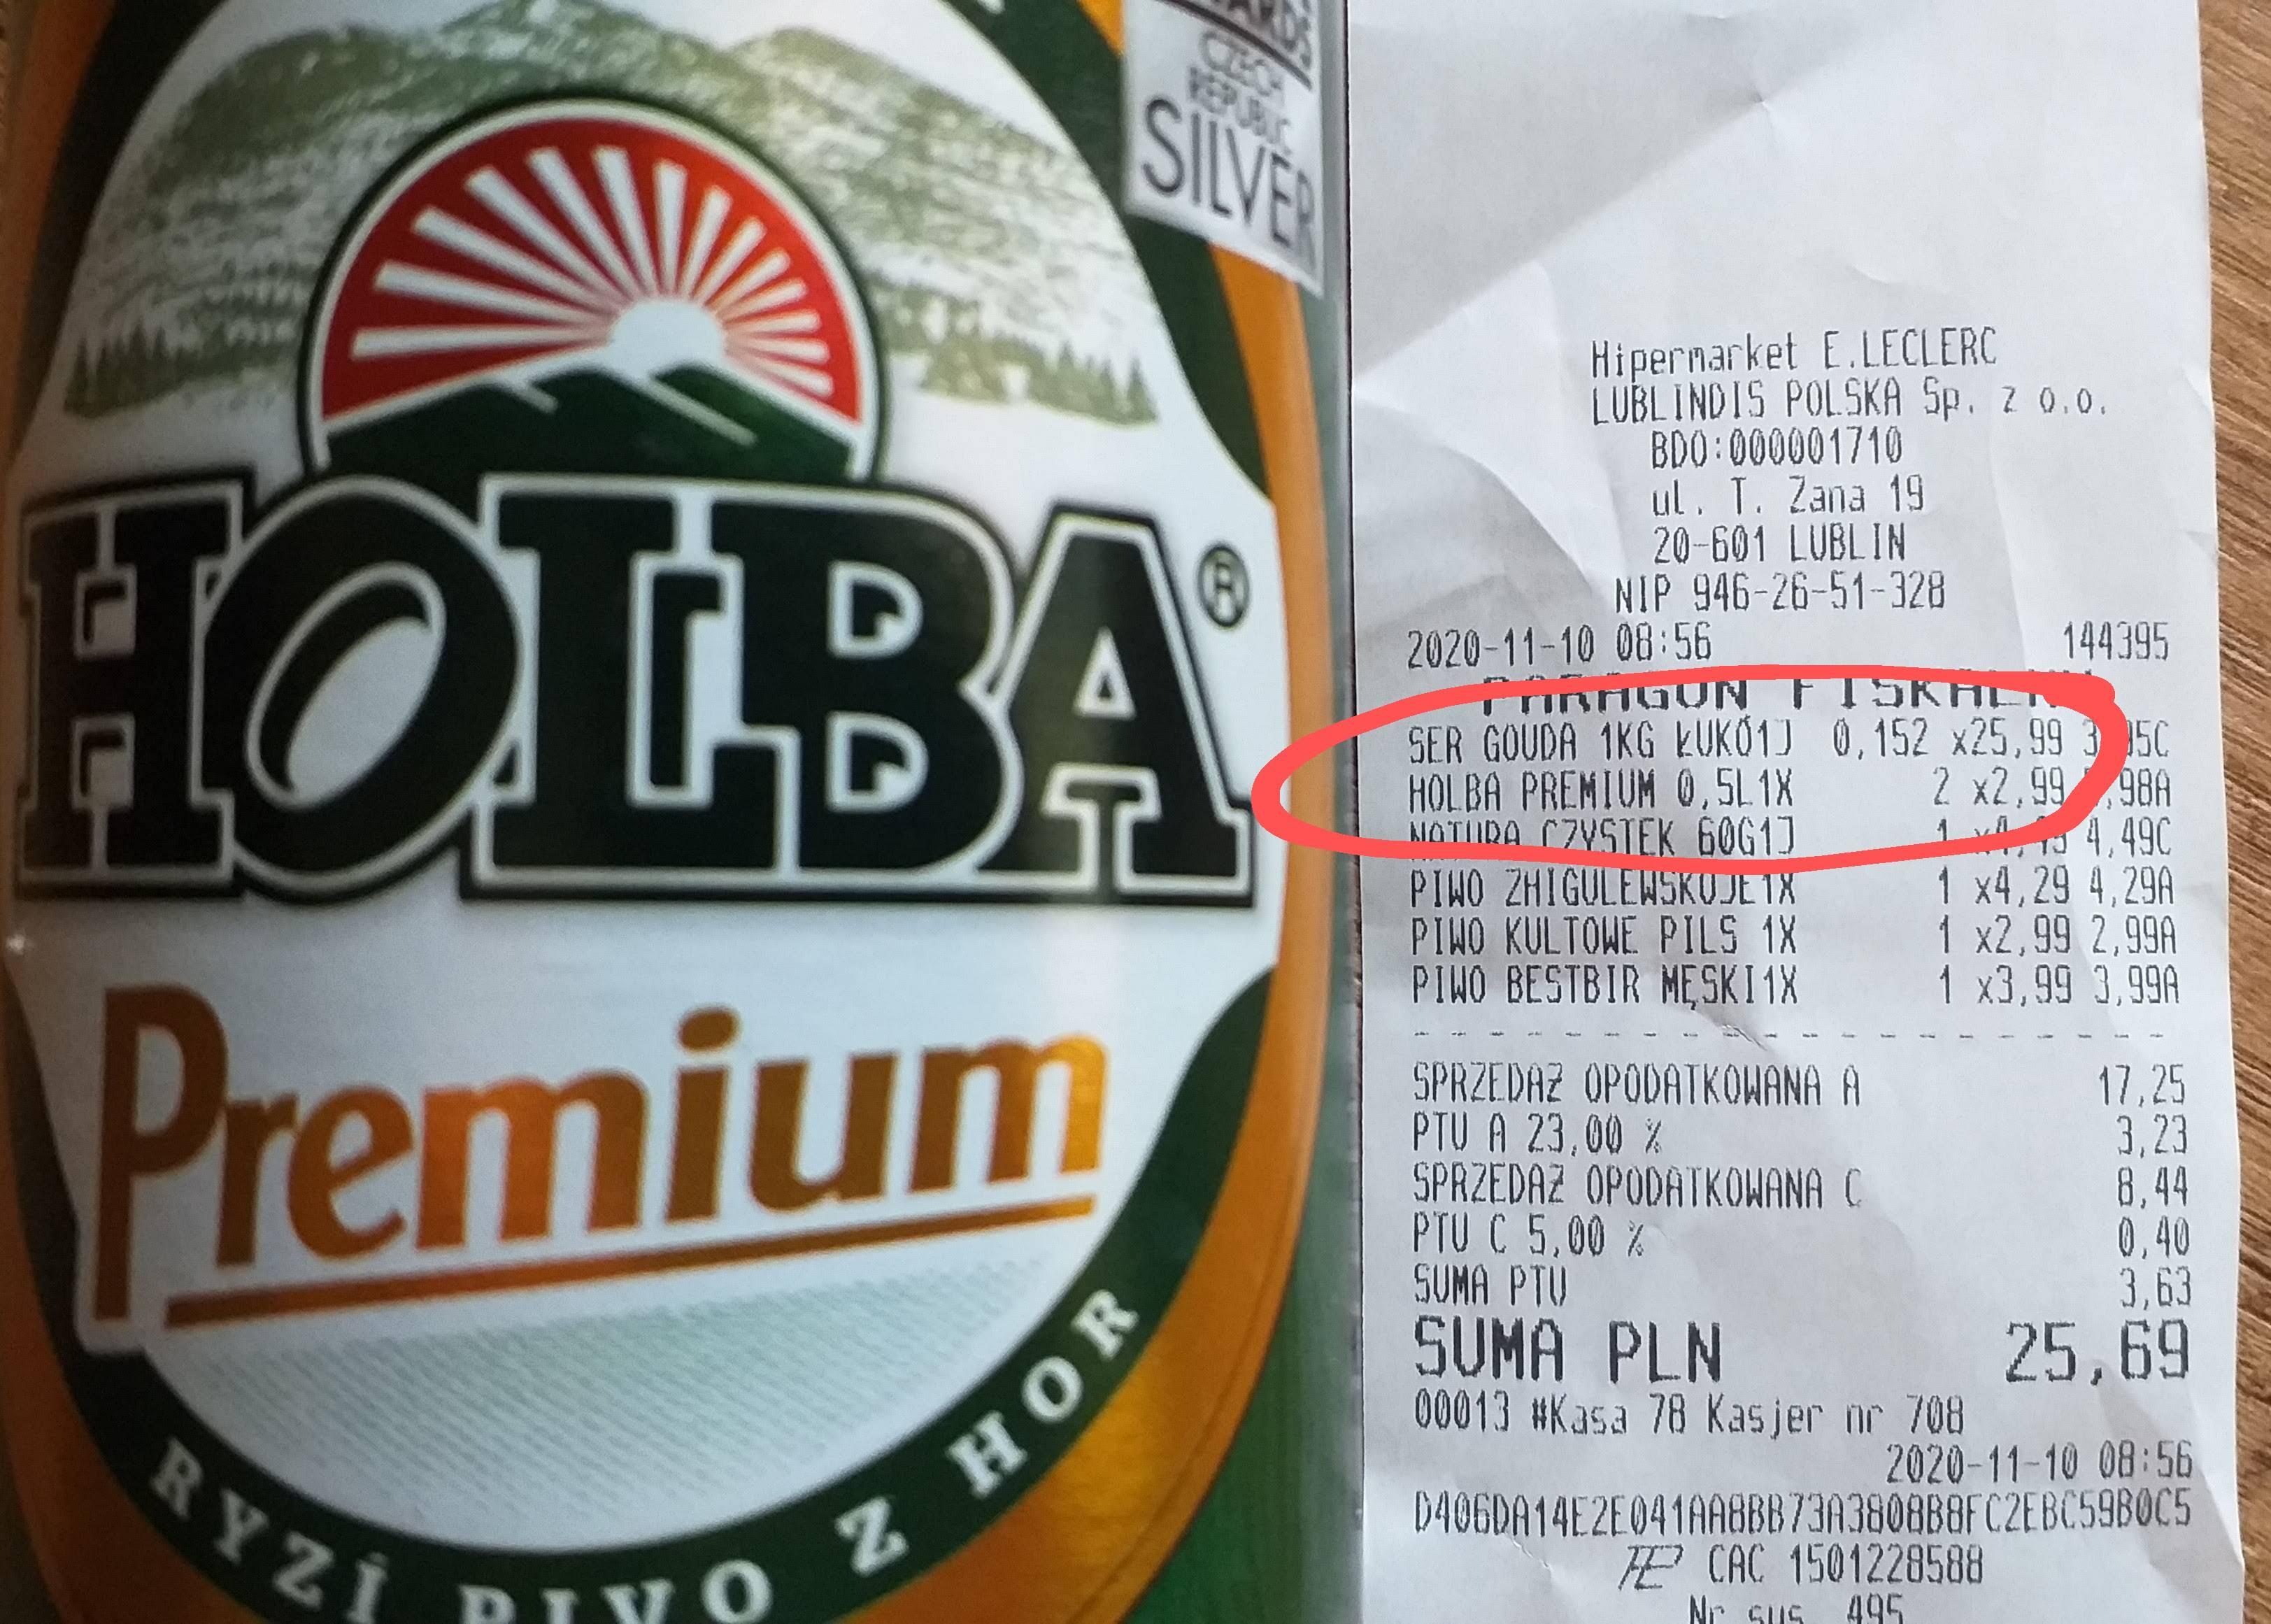 Holba Premium 0,5 L @ Leclerc